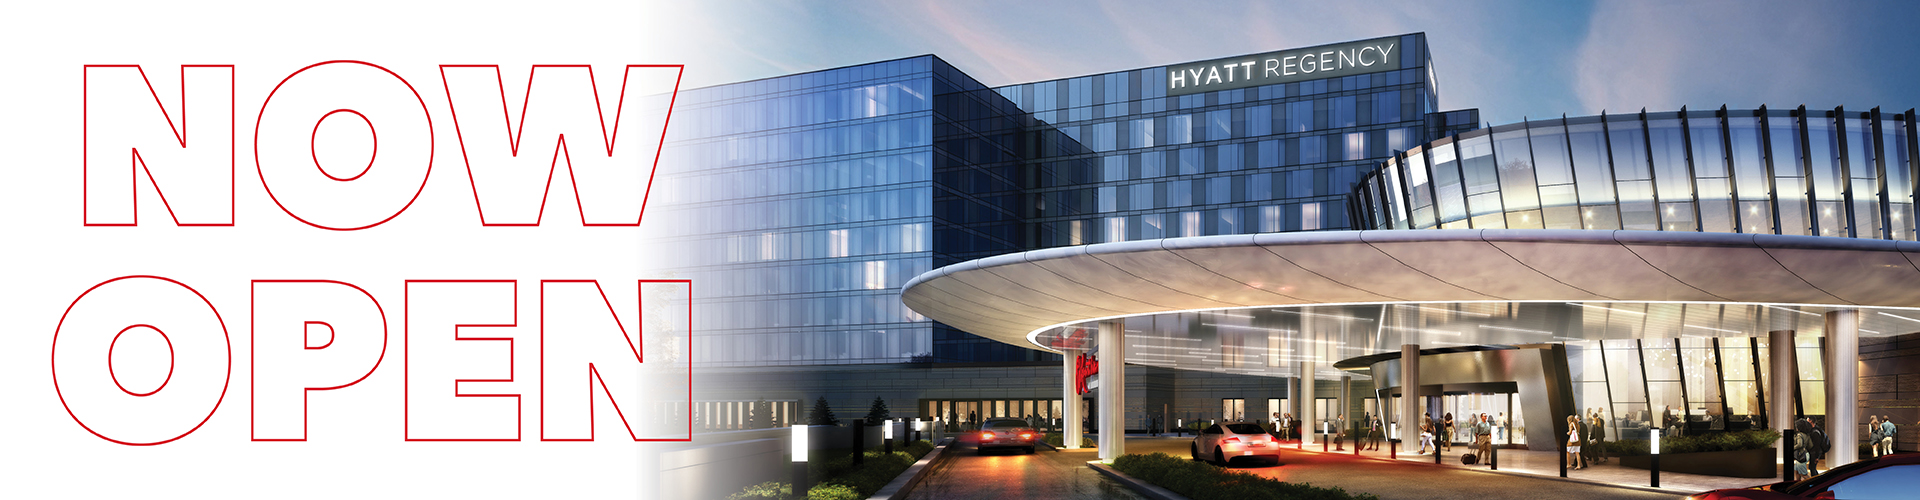 Hyatt hotel now open